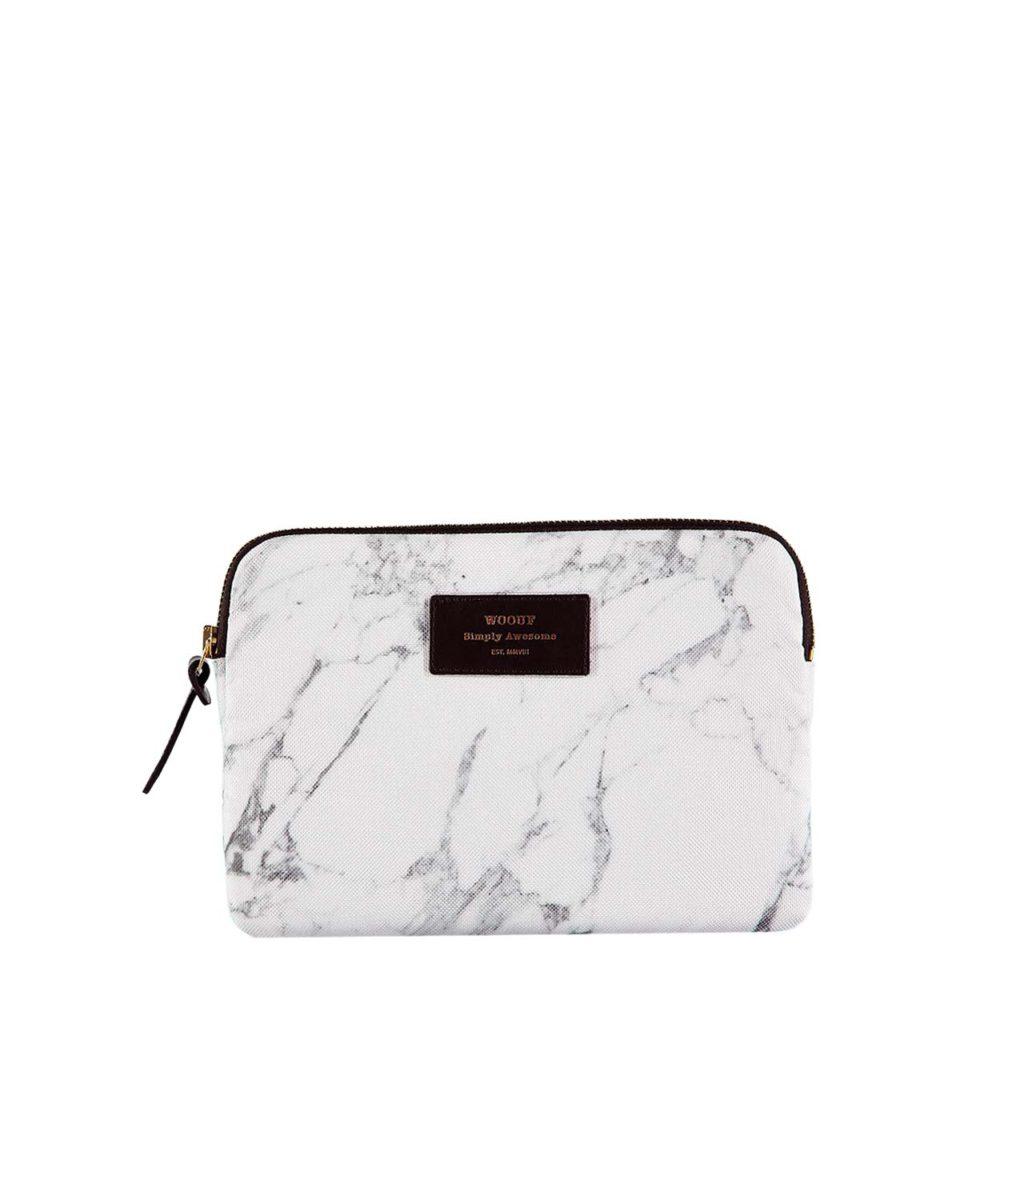 mini-ipad-marble-woouf